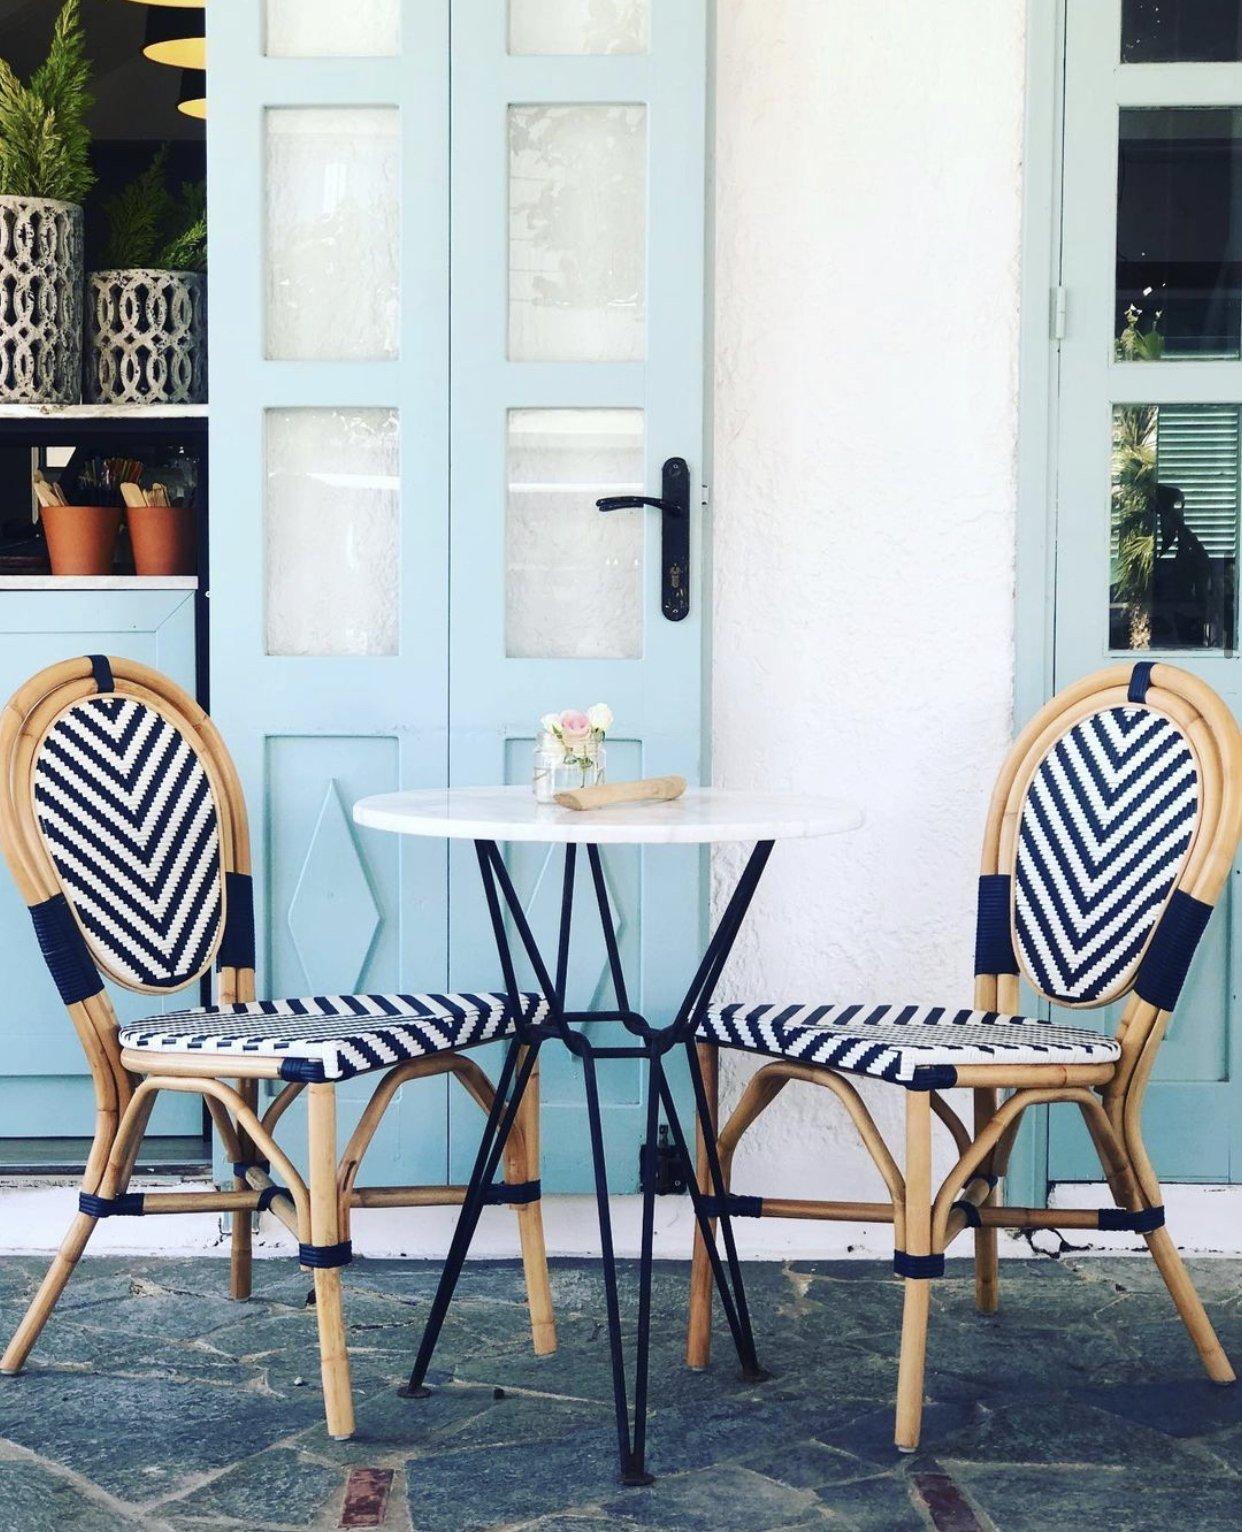 Lovemade café bistrot